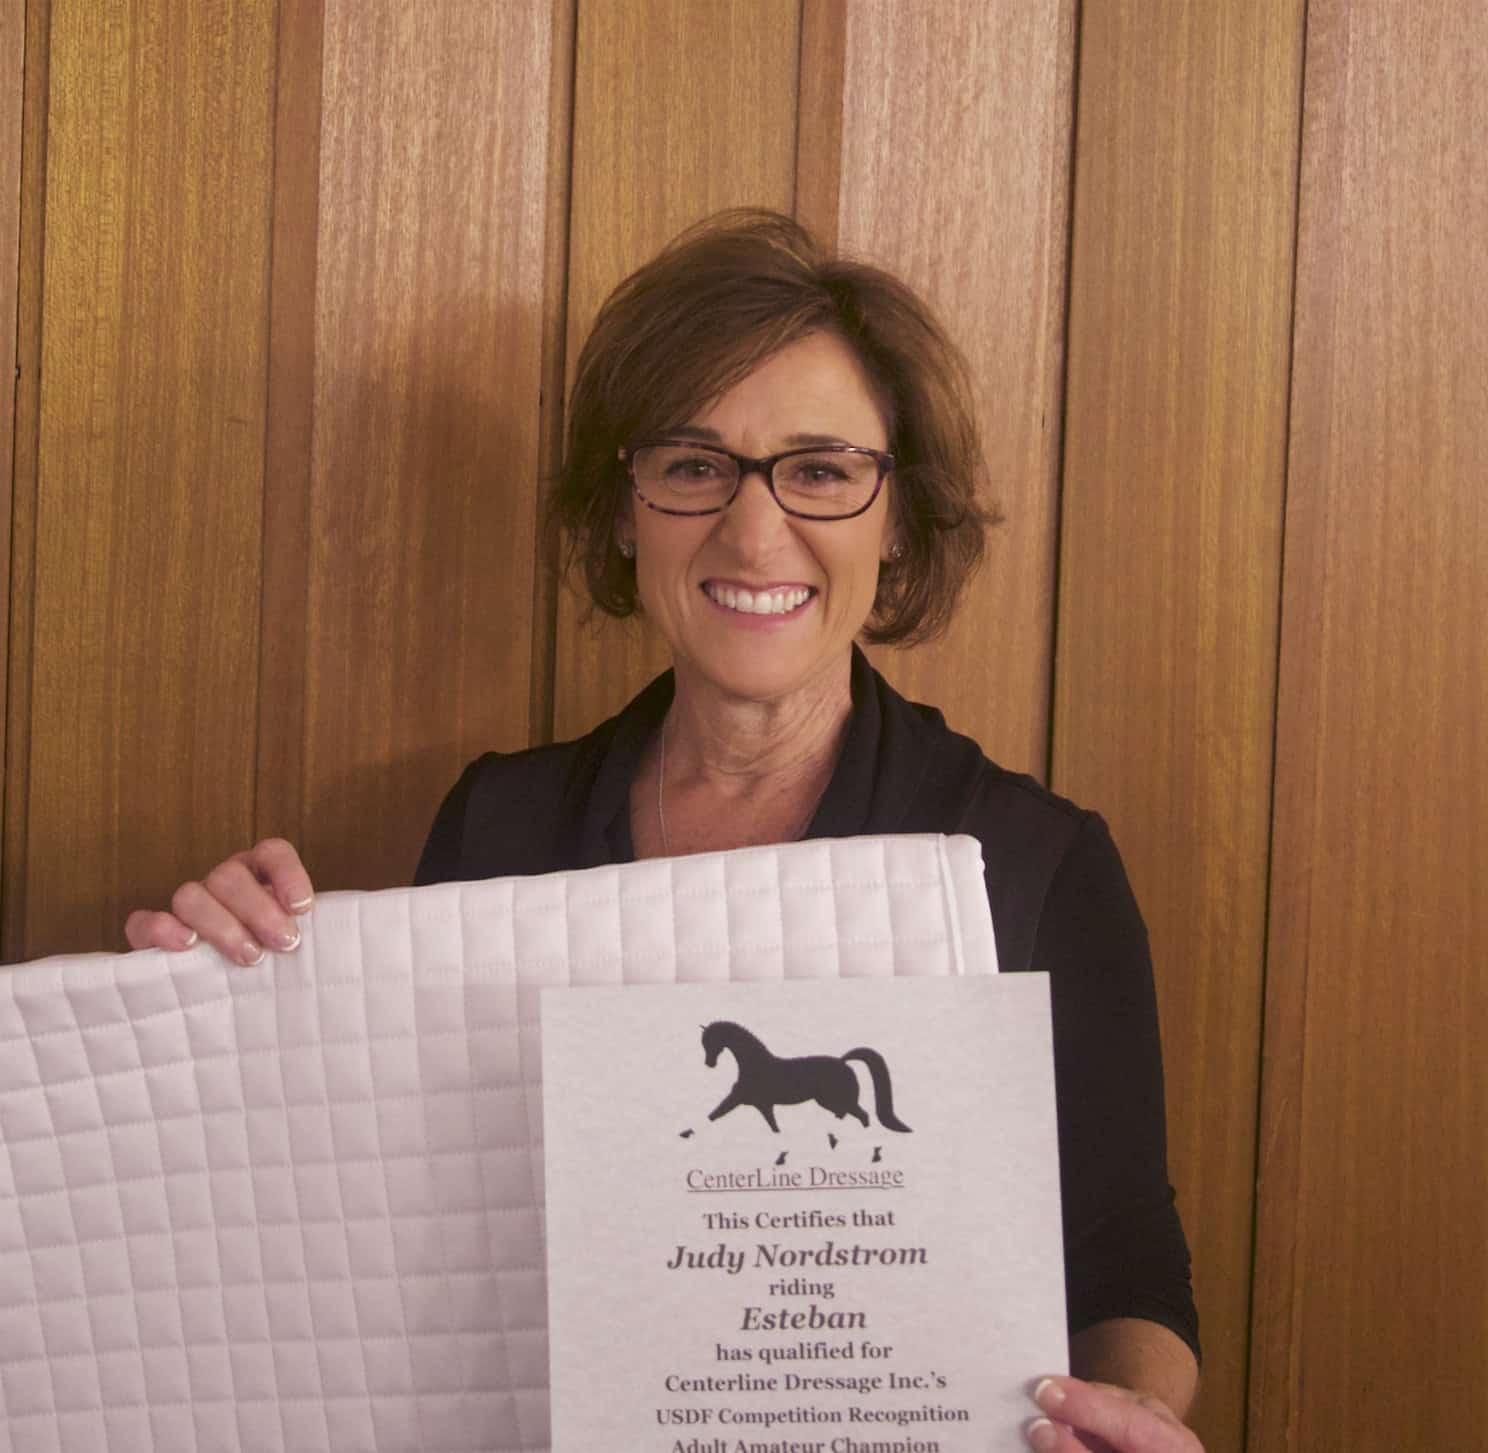 Judy Nordstrom accepts an award